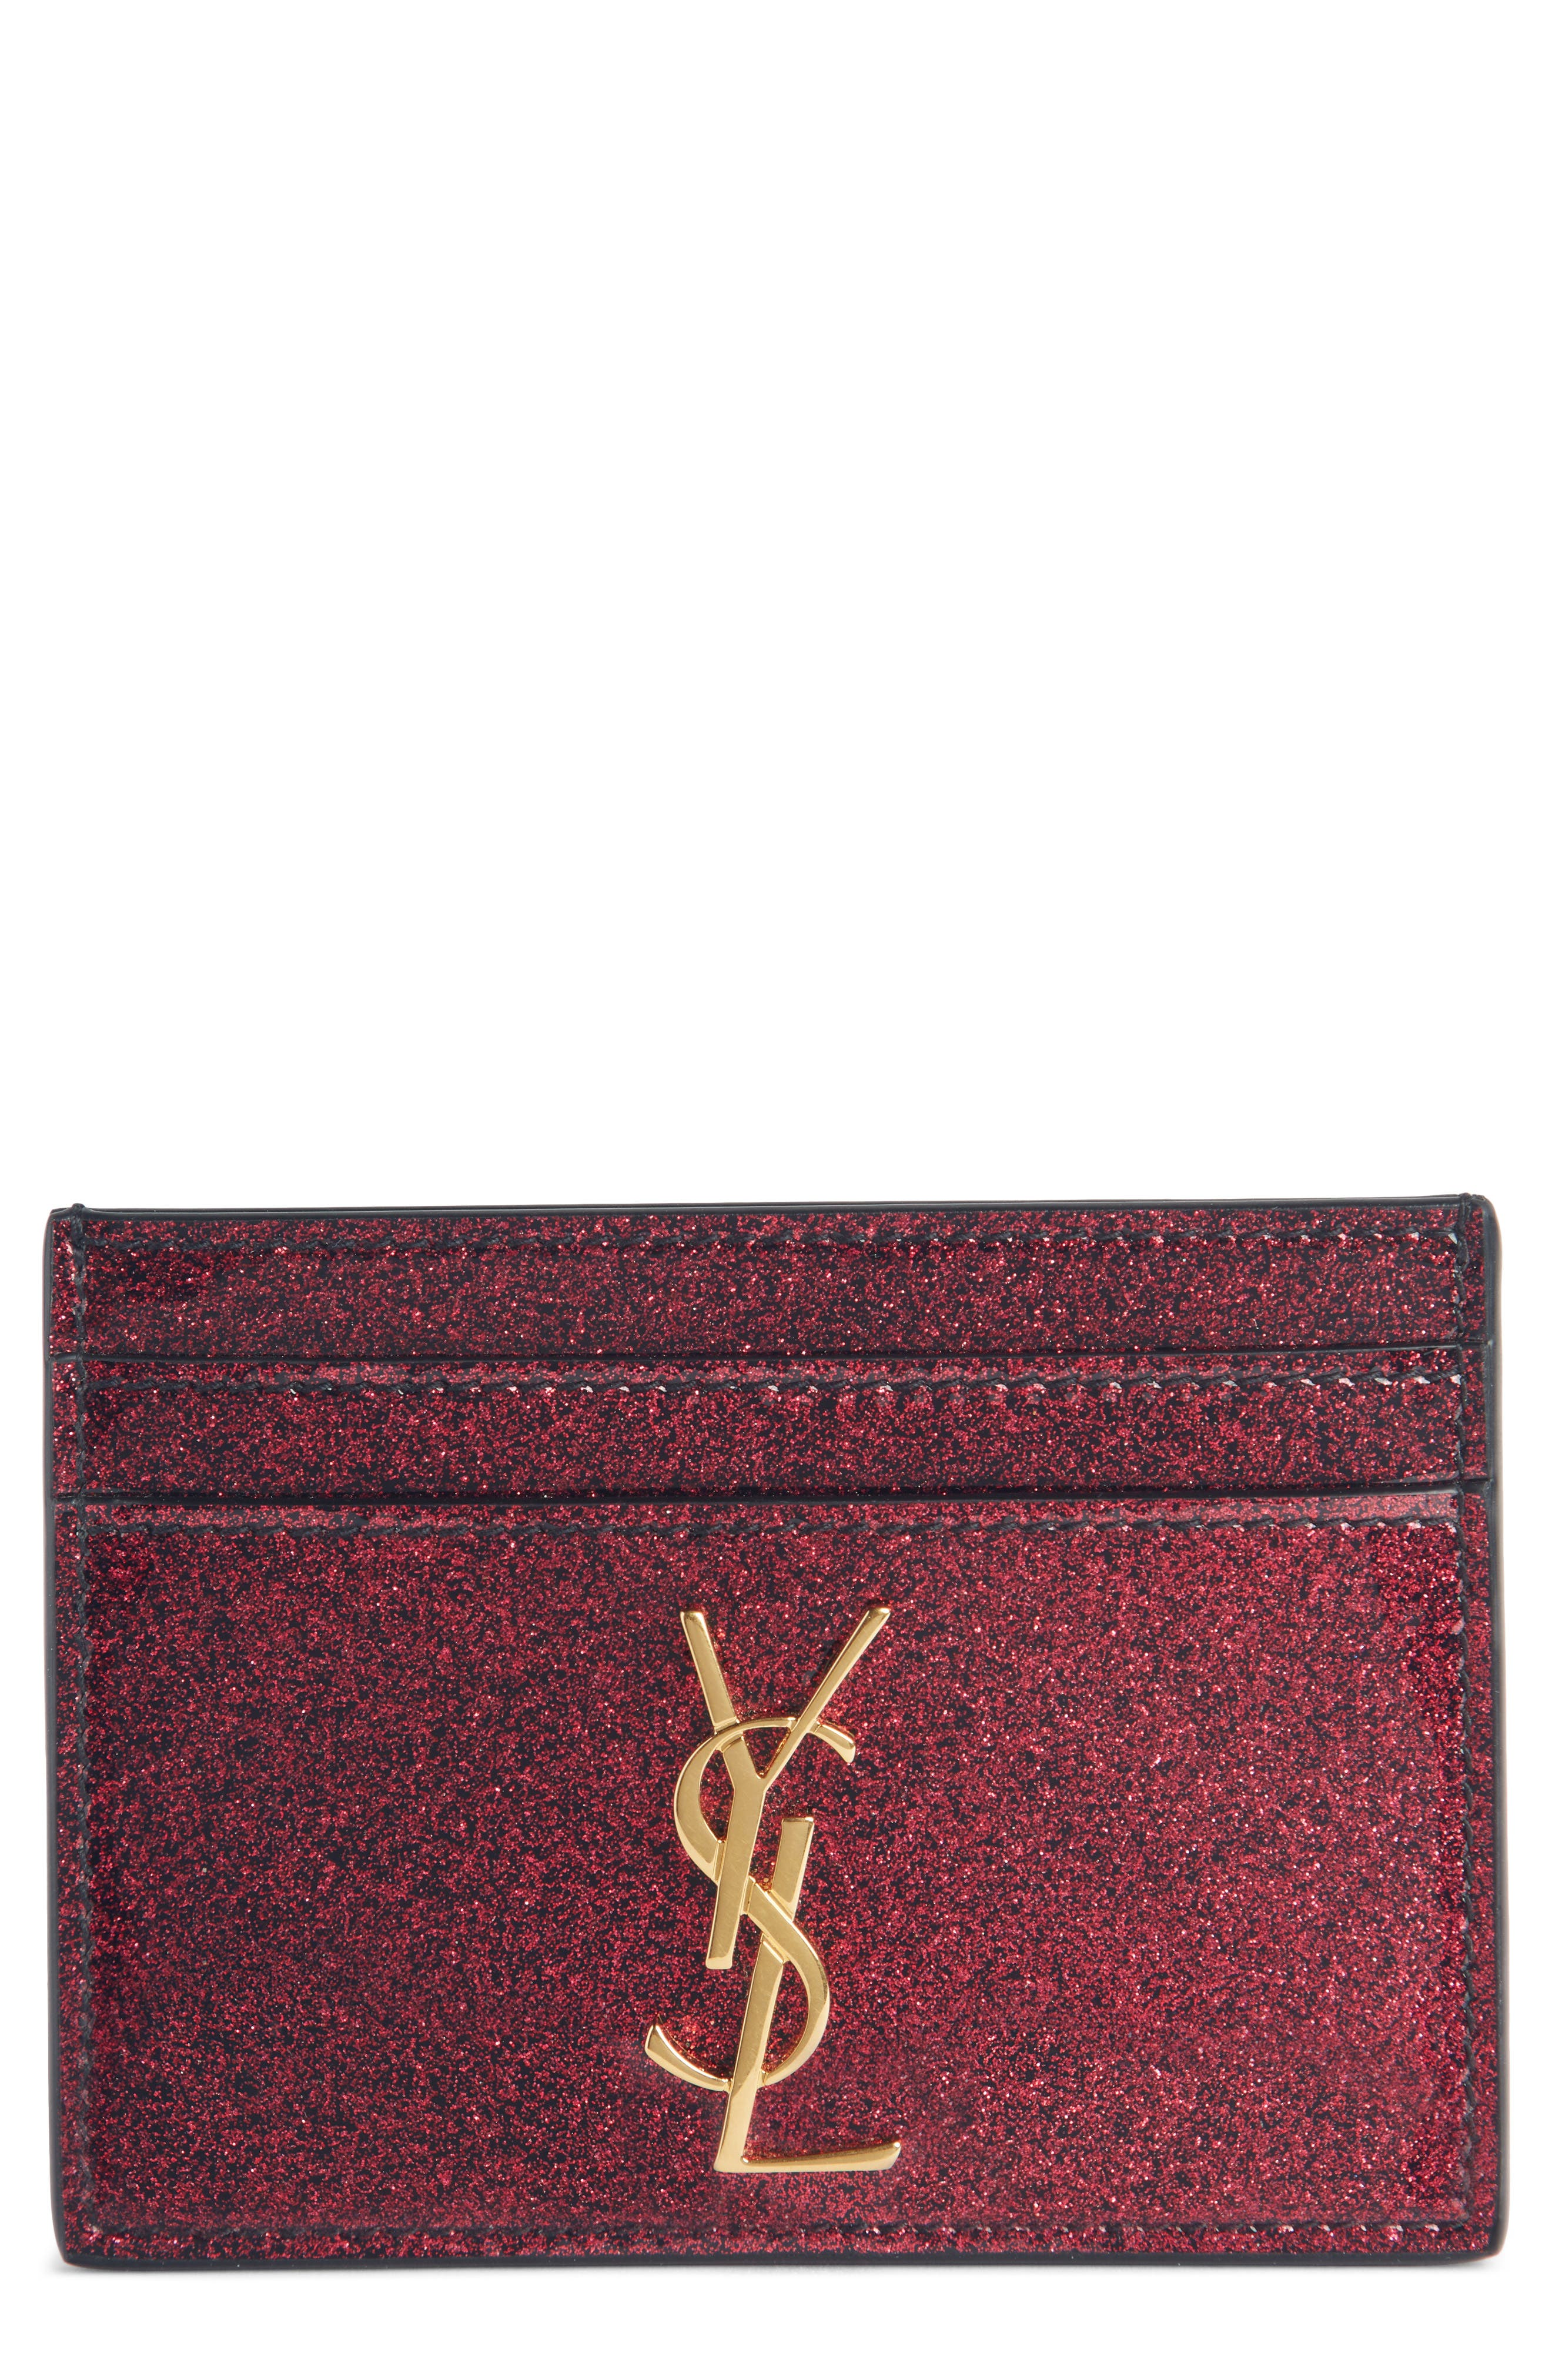 Monogram Vernis Glitter Calfskin Leather Card Case,                         Main,                         color, 650